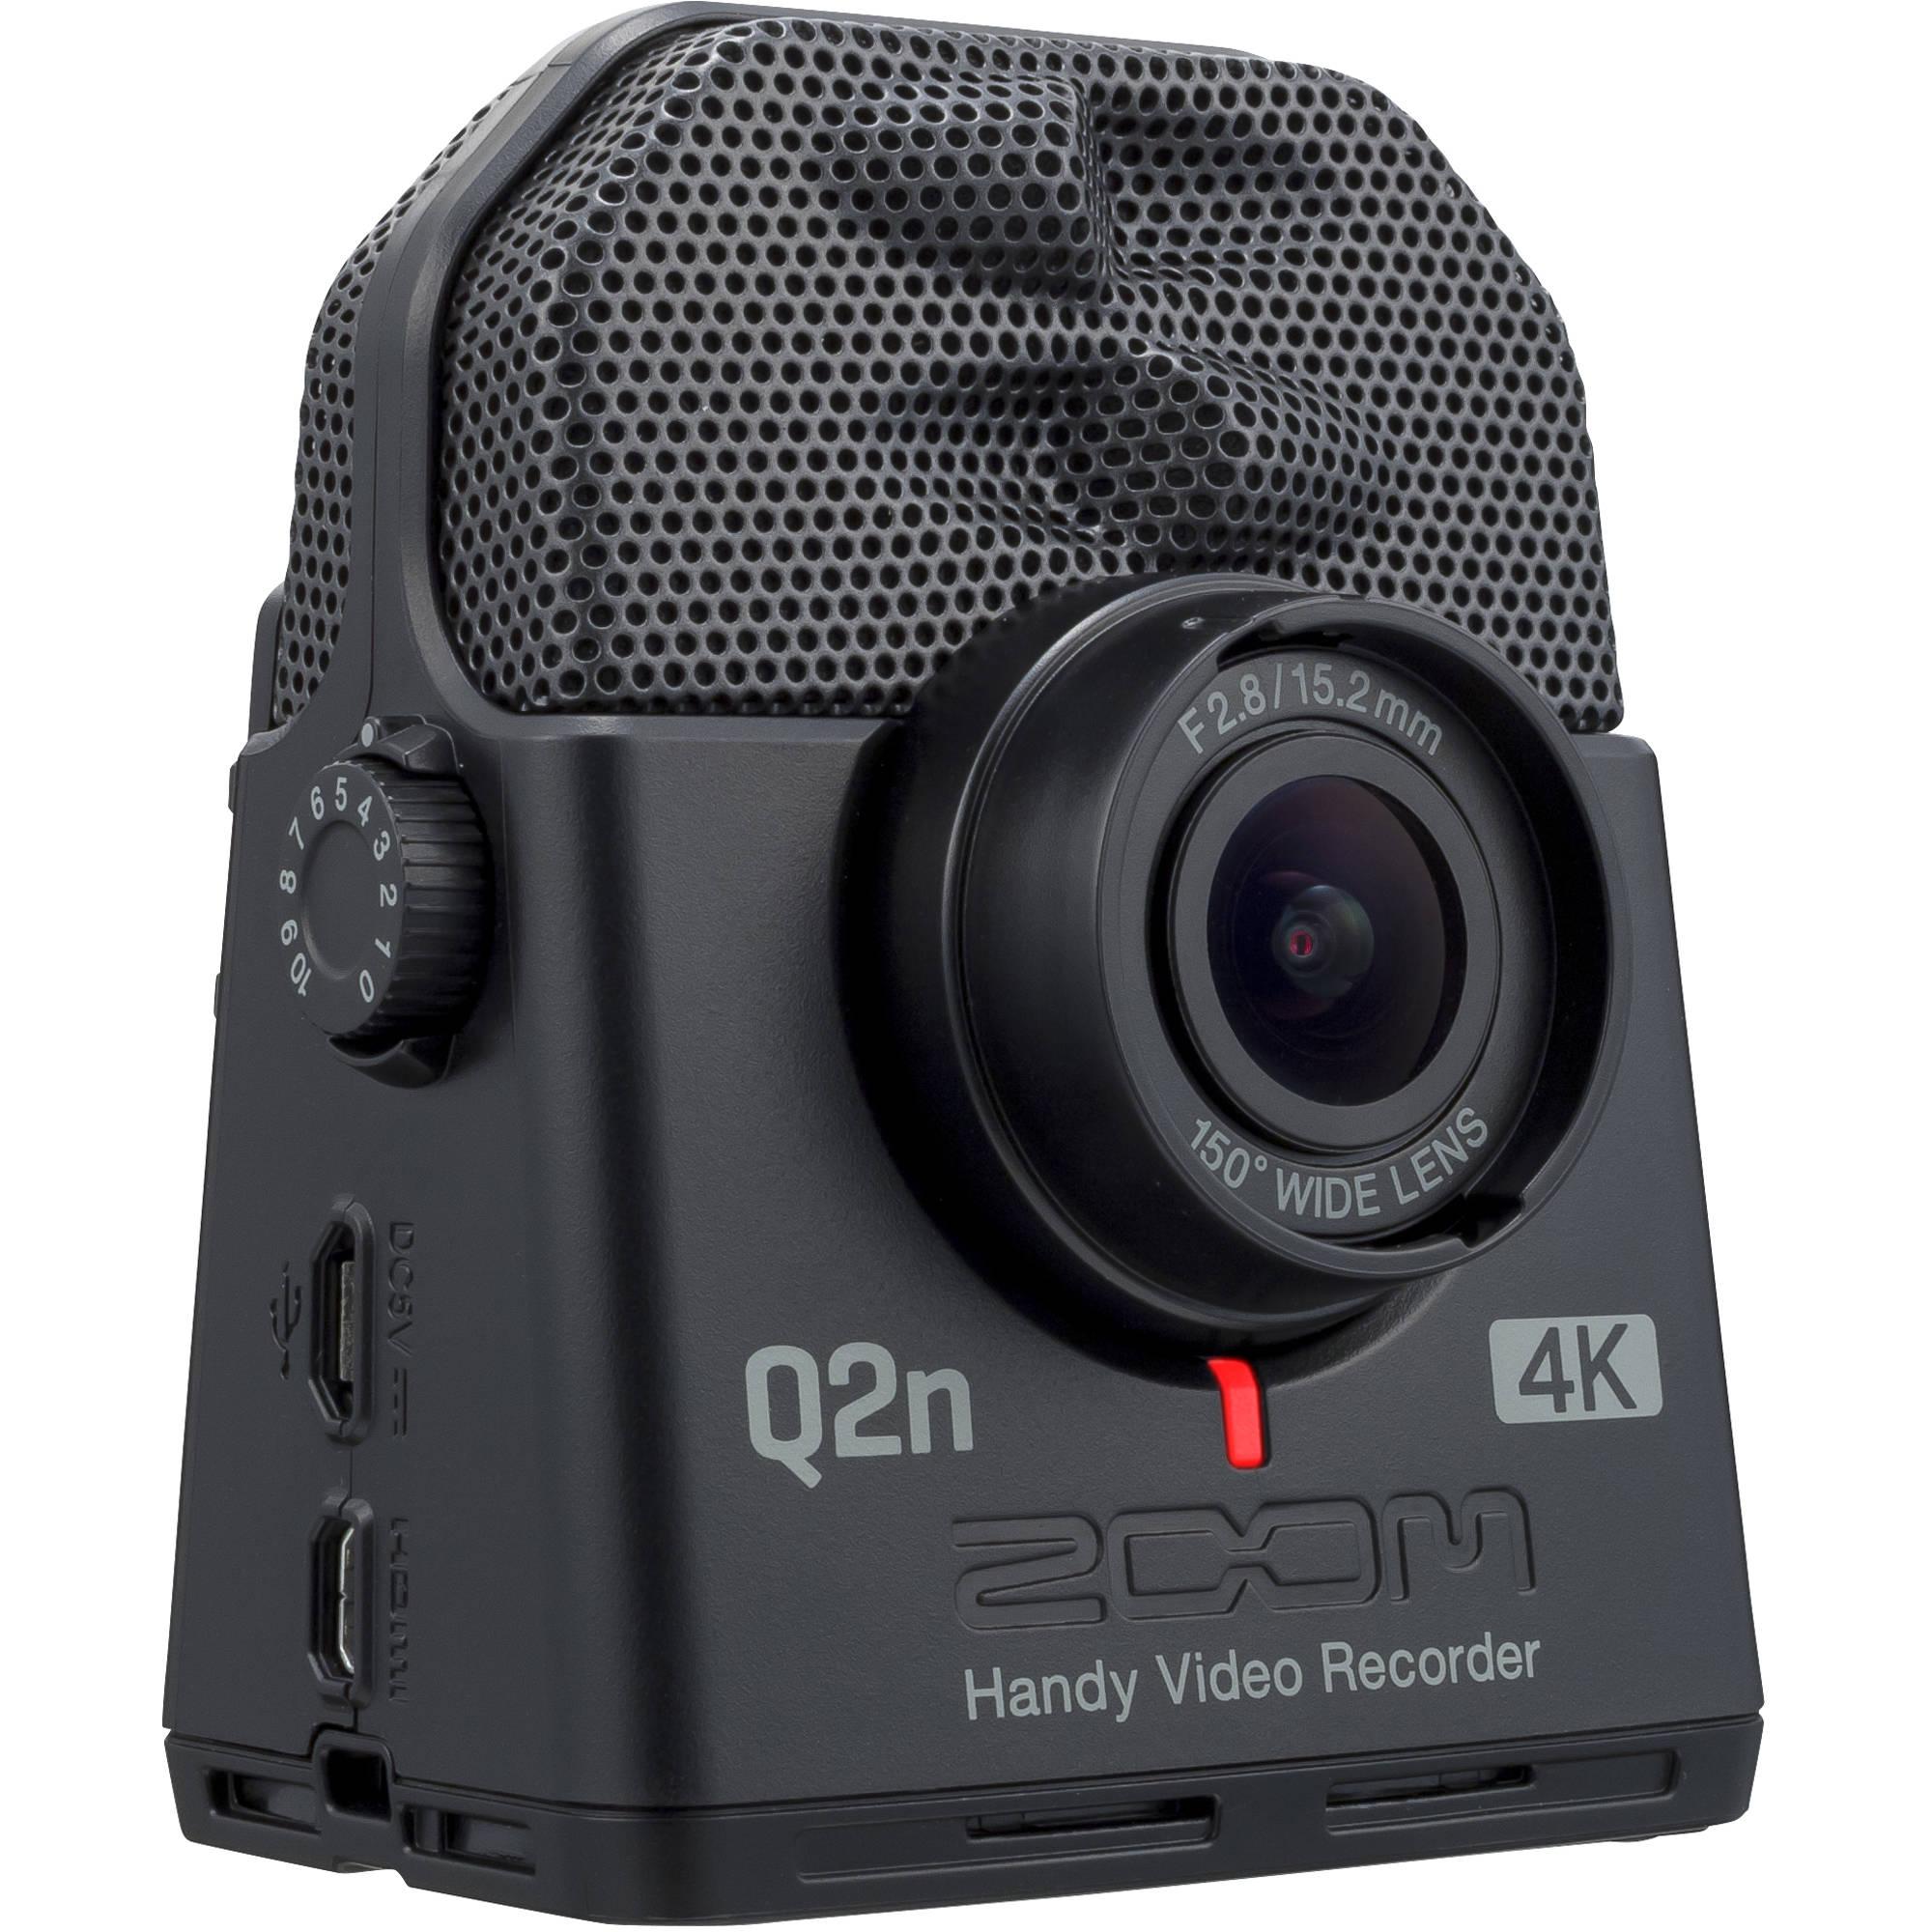 zoom q2n 4k handy video recorder zq2n4k b h photo video. Black Bedroom Furniture Sets. Home Design Ideas